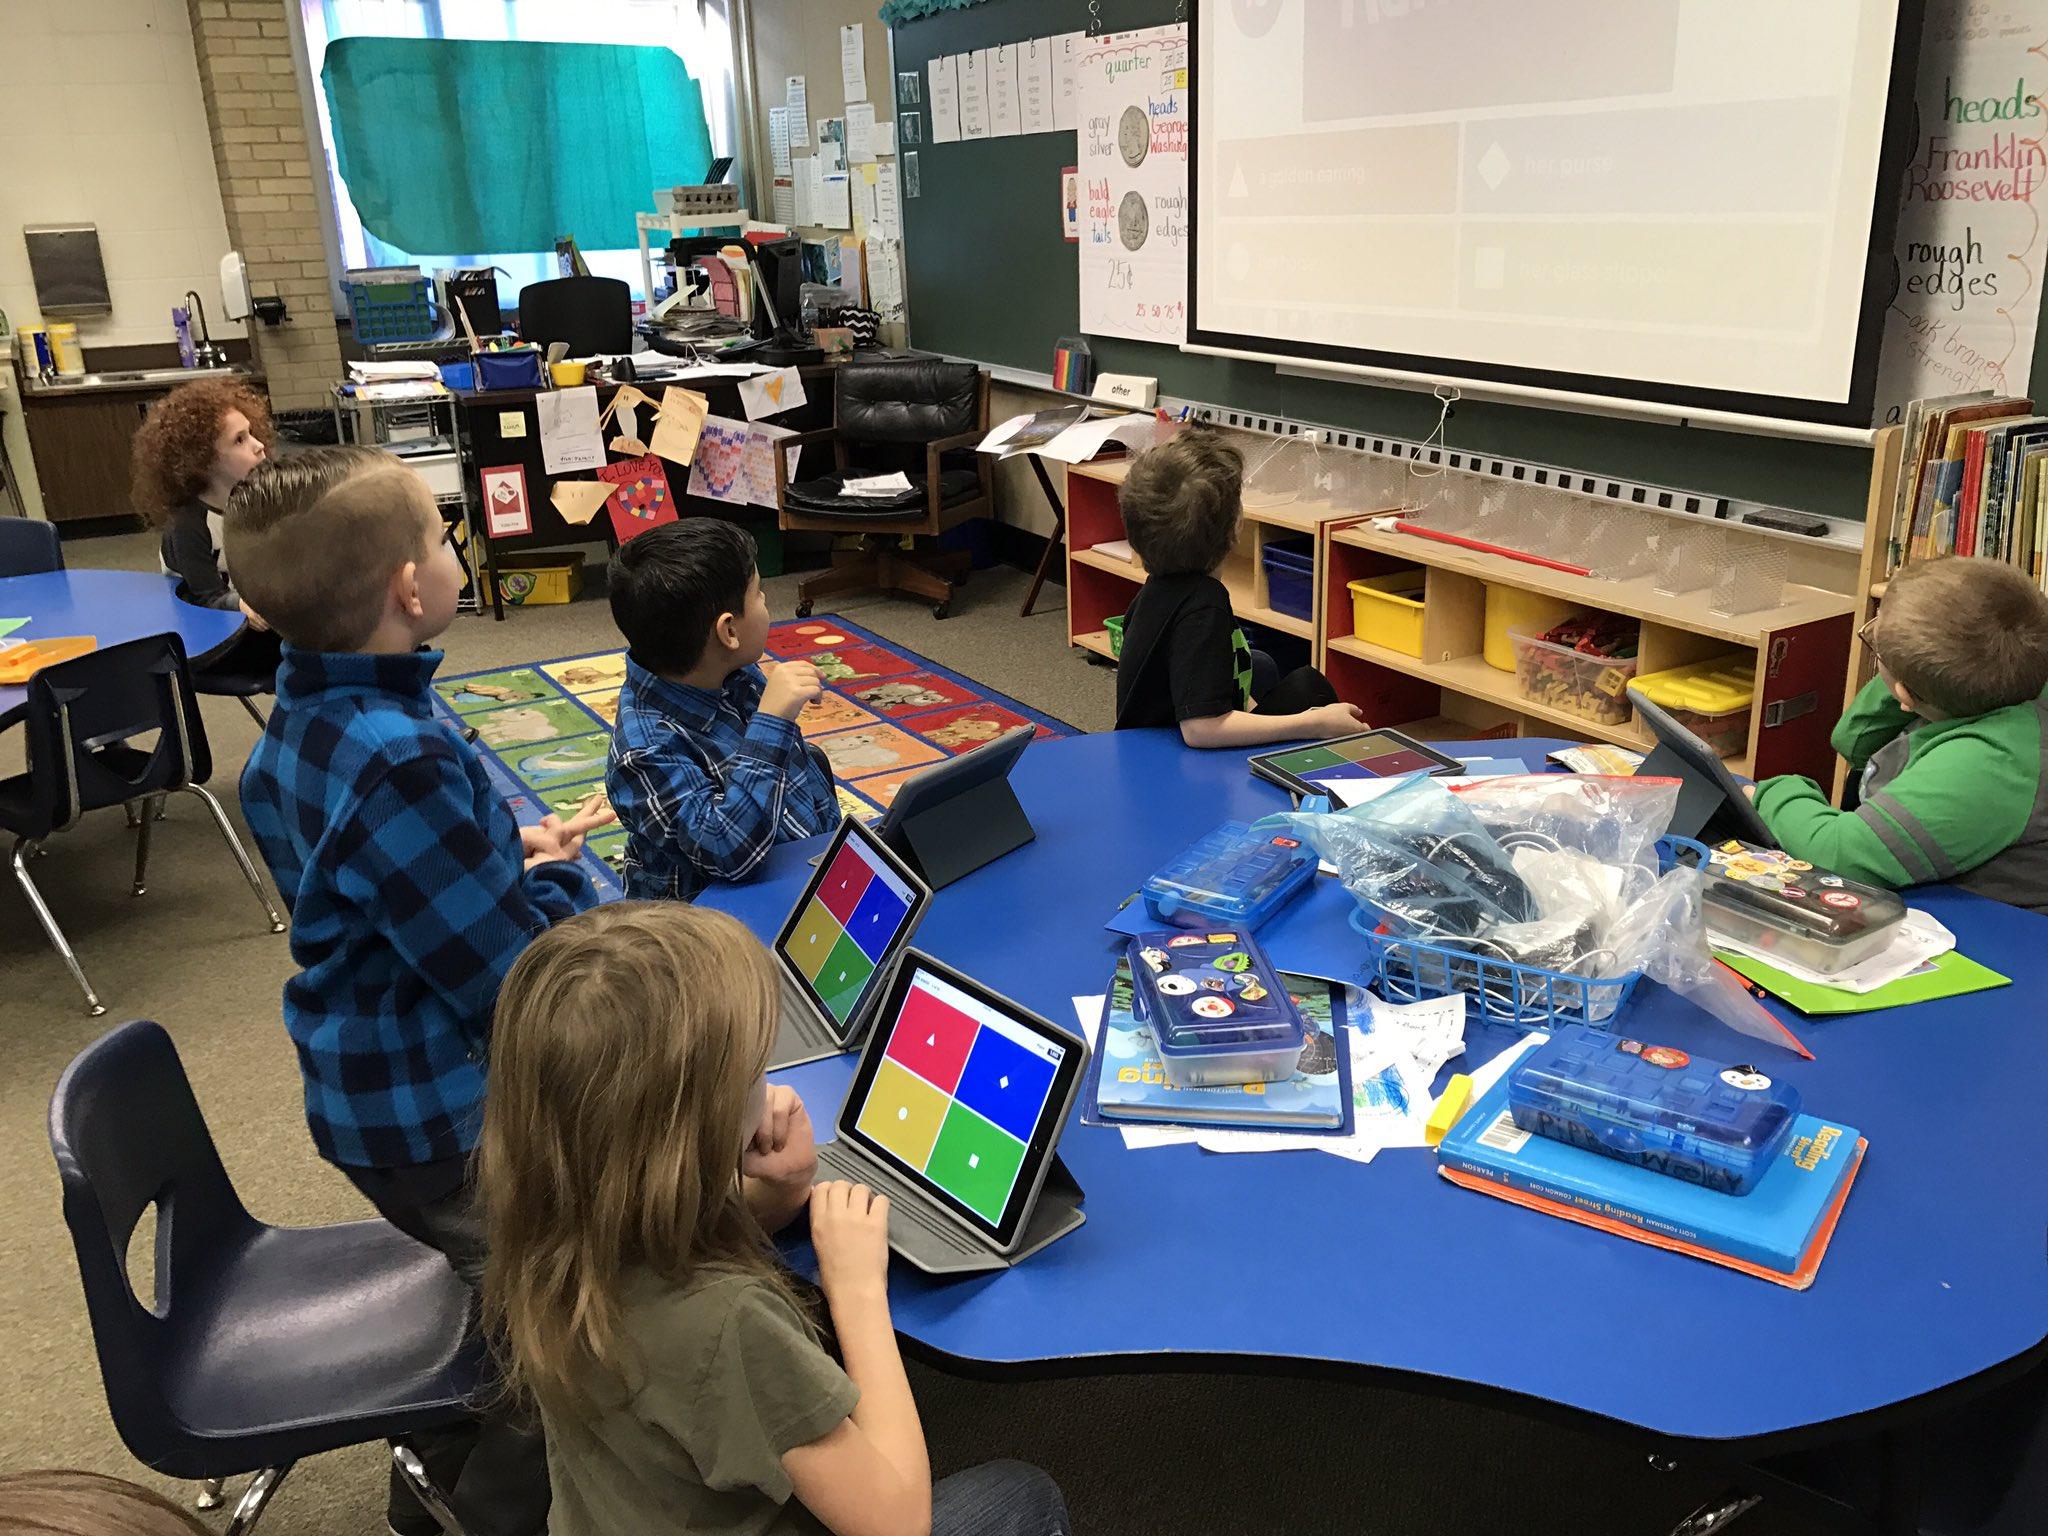 1st graders using Kahoot in reading for comprehension #DLDAY #JCSC #northvernonelementary https://t.co/1N80aJyL4v